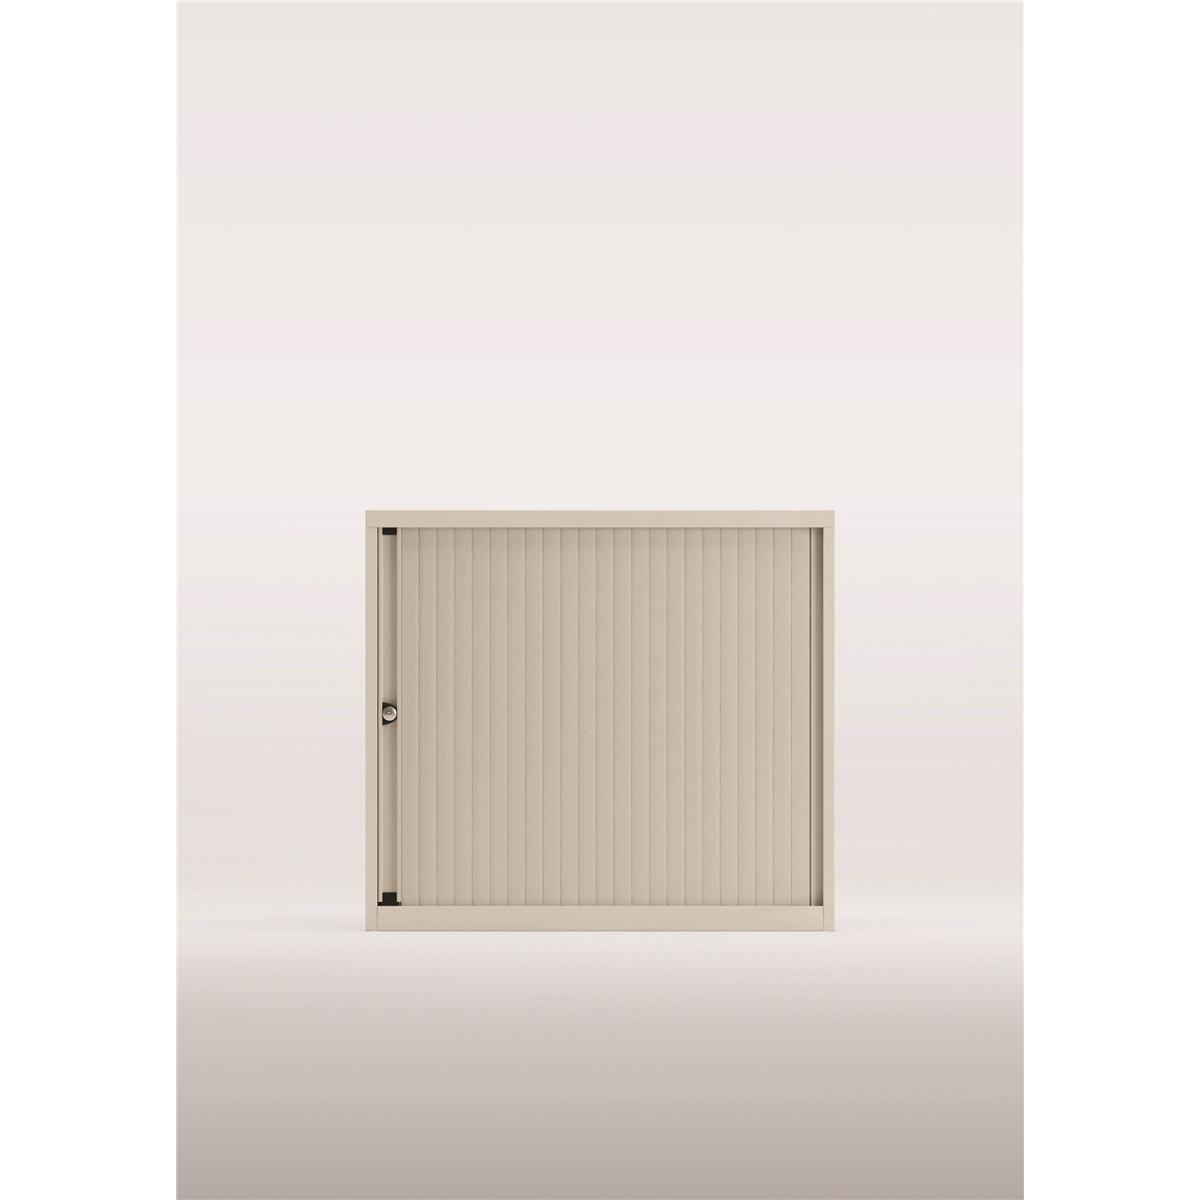 Storage cabinets Bisley Desk High Tambour Door Cupboard 800x470x693-708mm White/Silver Ref YETBDH0807/1S.SL-ab9